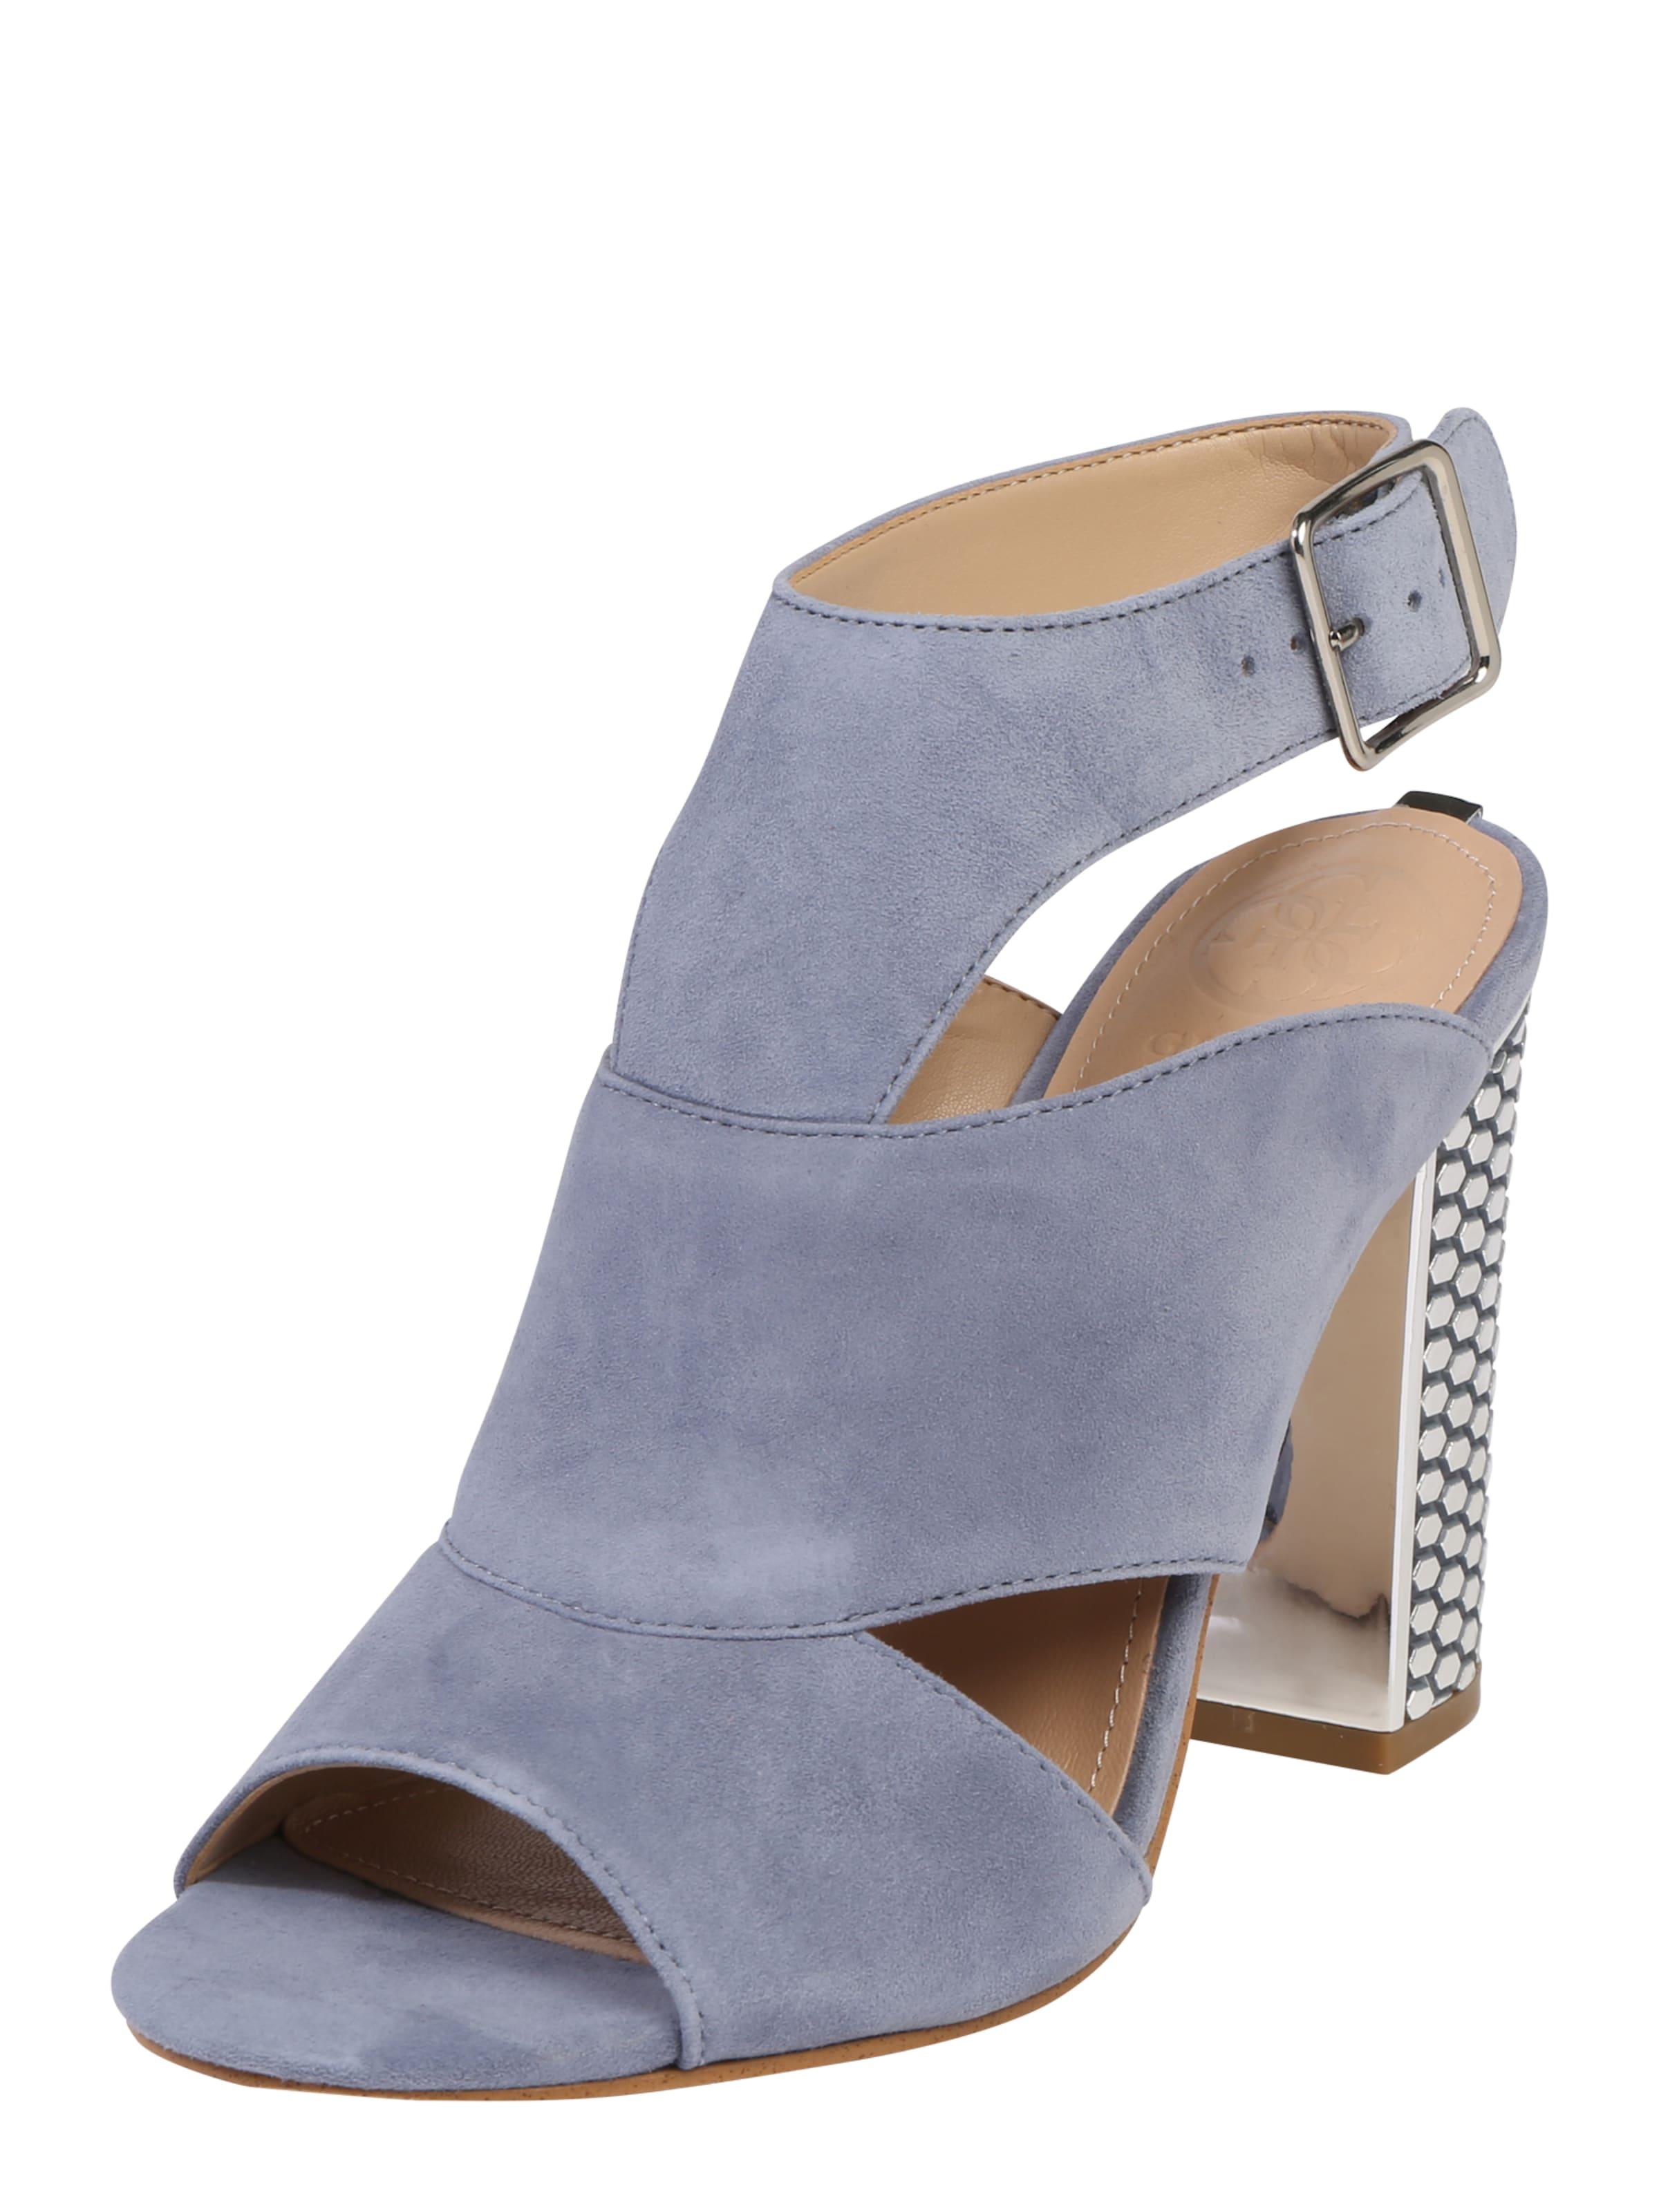 GUESS Sandale ABBIEN Verschleißfeste billige Schuhe